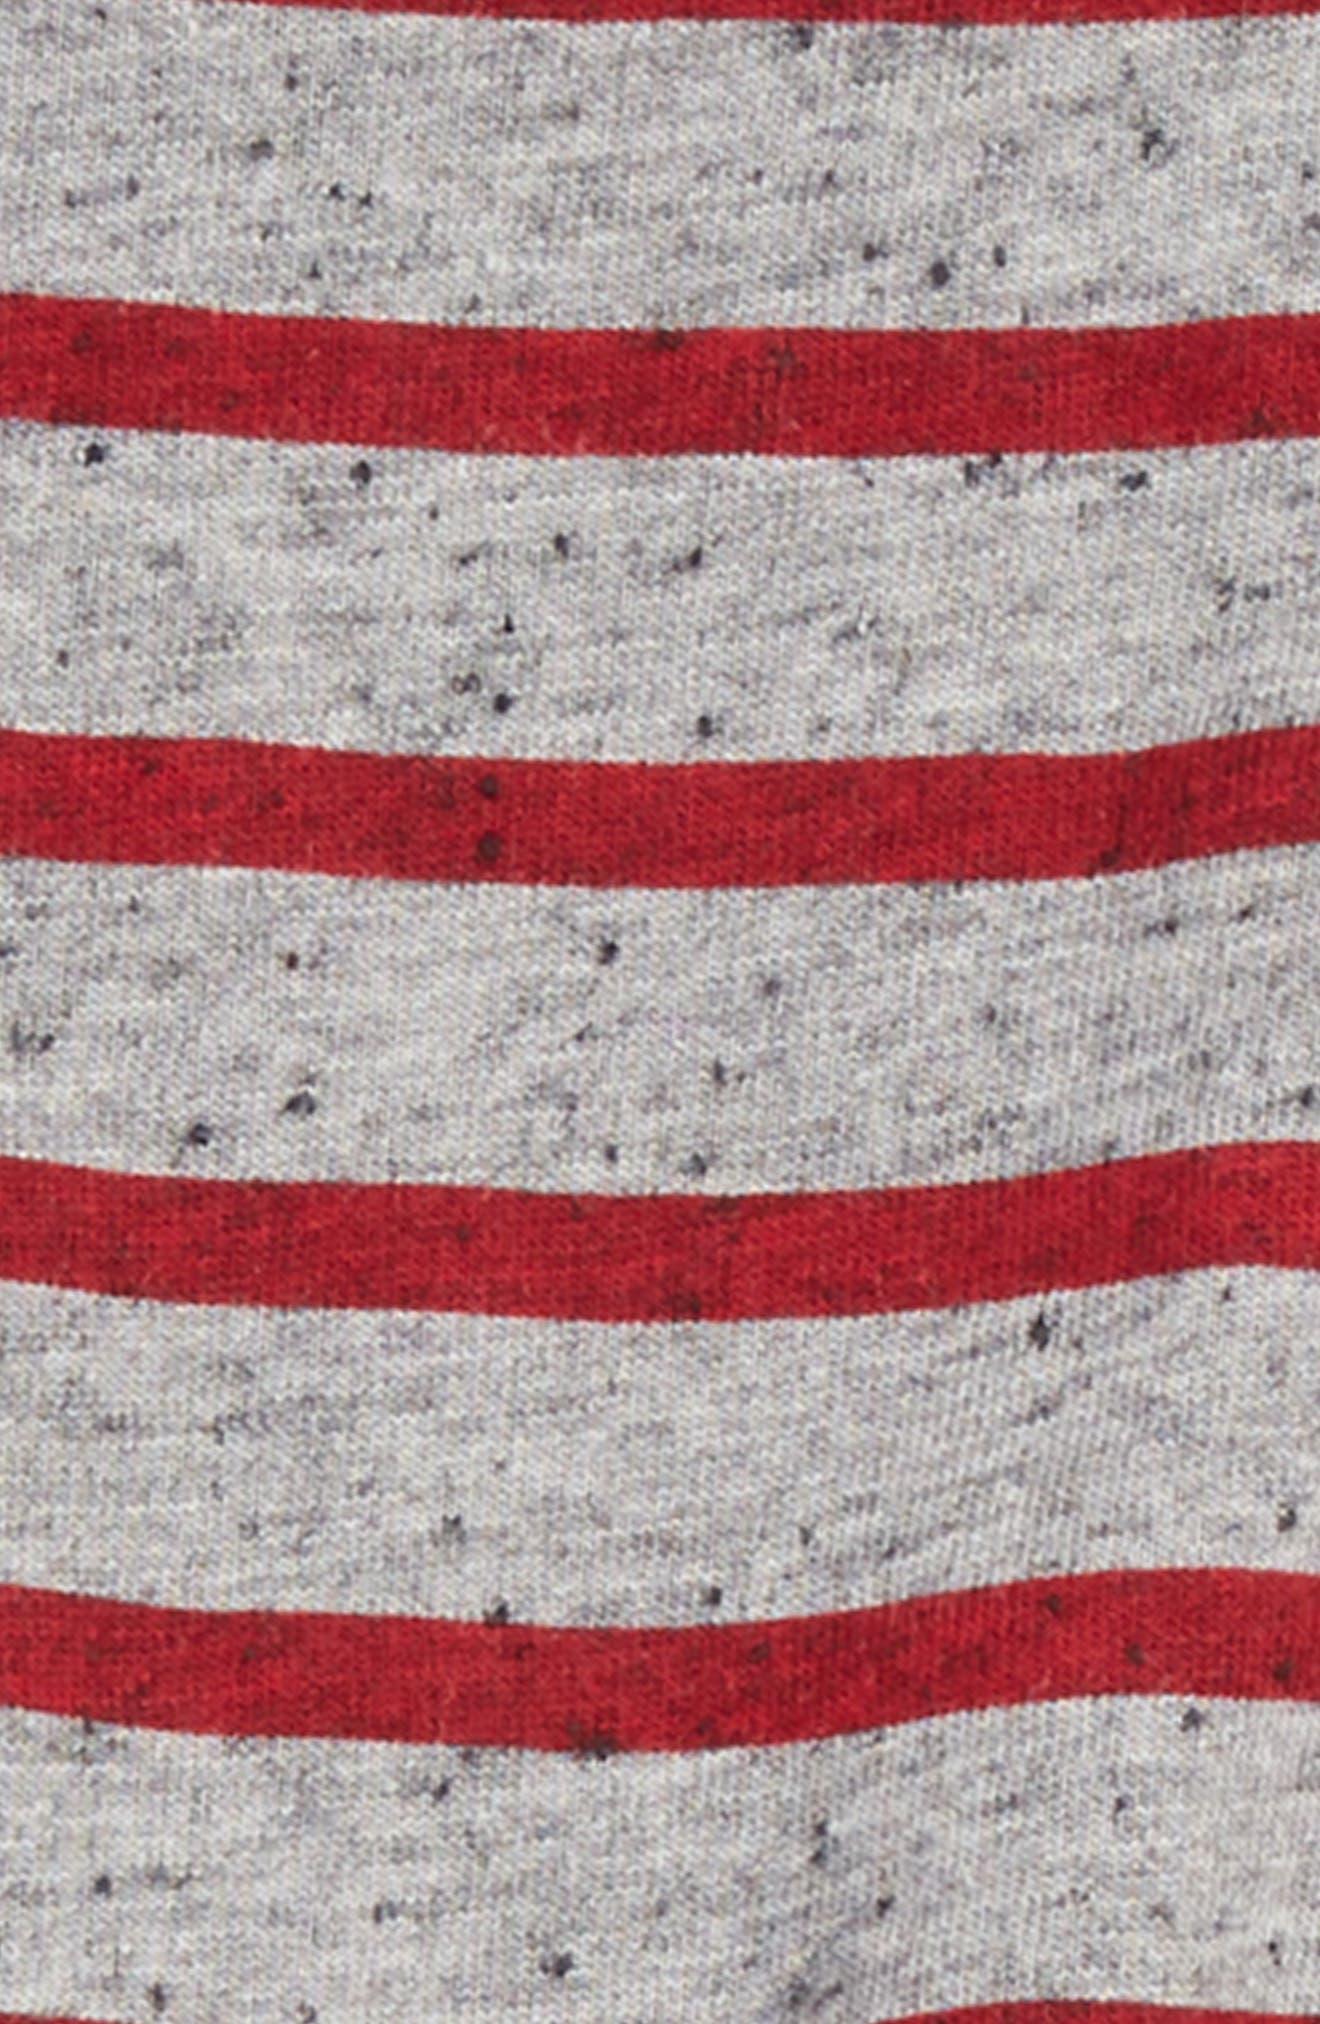 Thermal Raglan T-Shirt & Pants Set,                             Alternate thumbnail 2, color,                             600